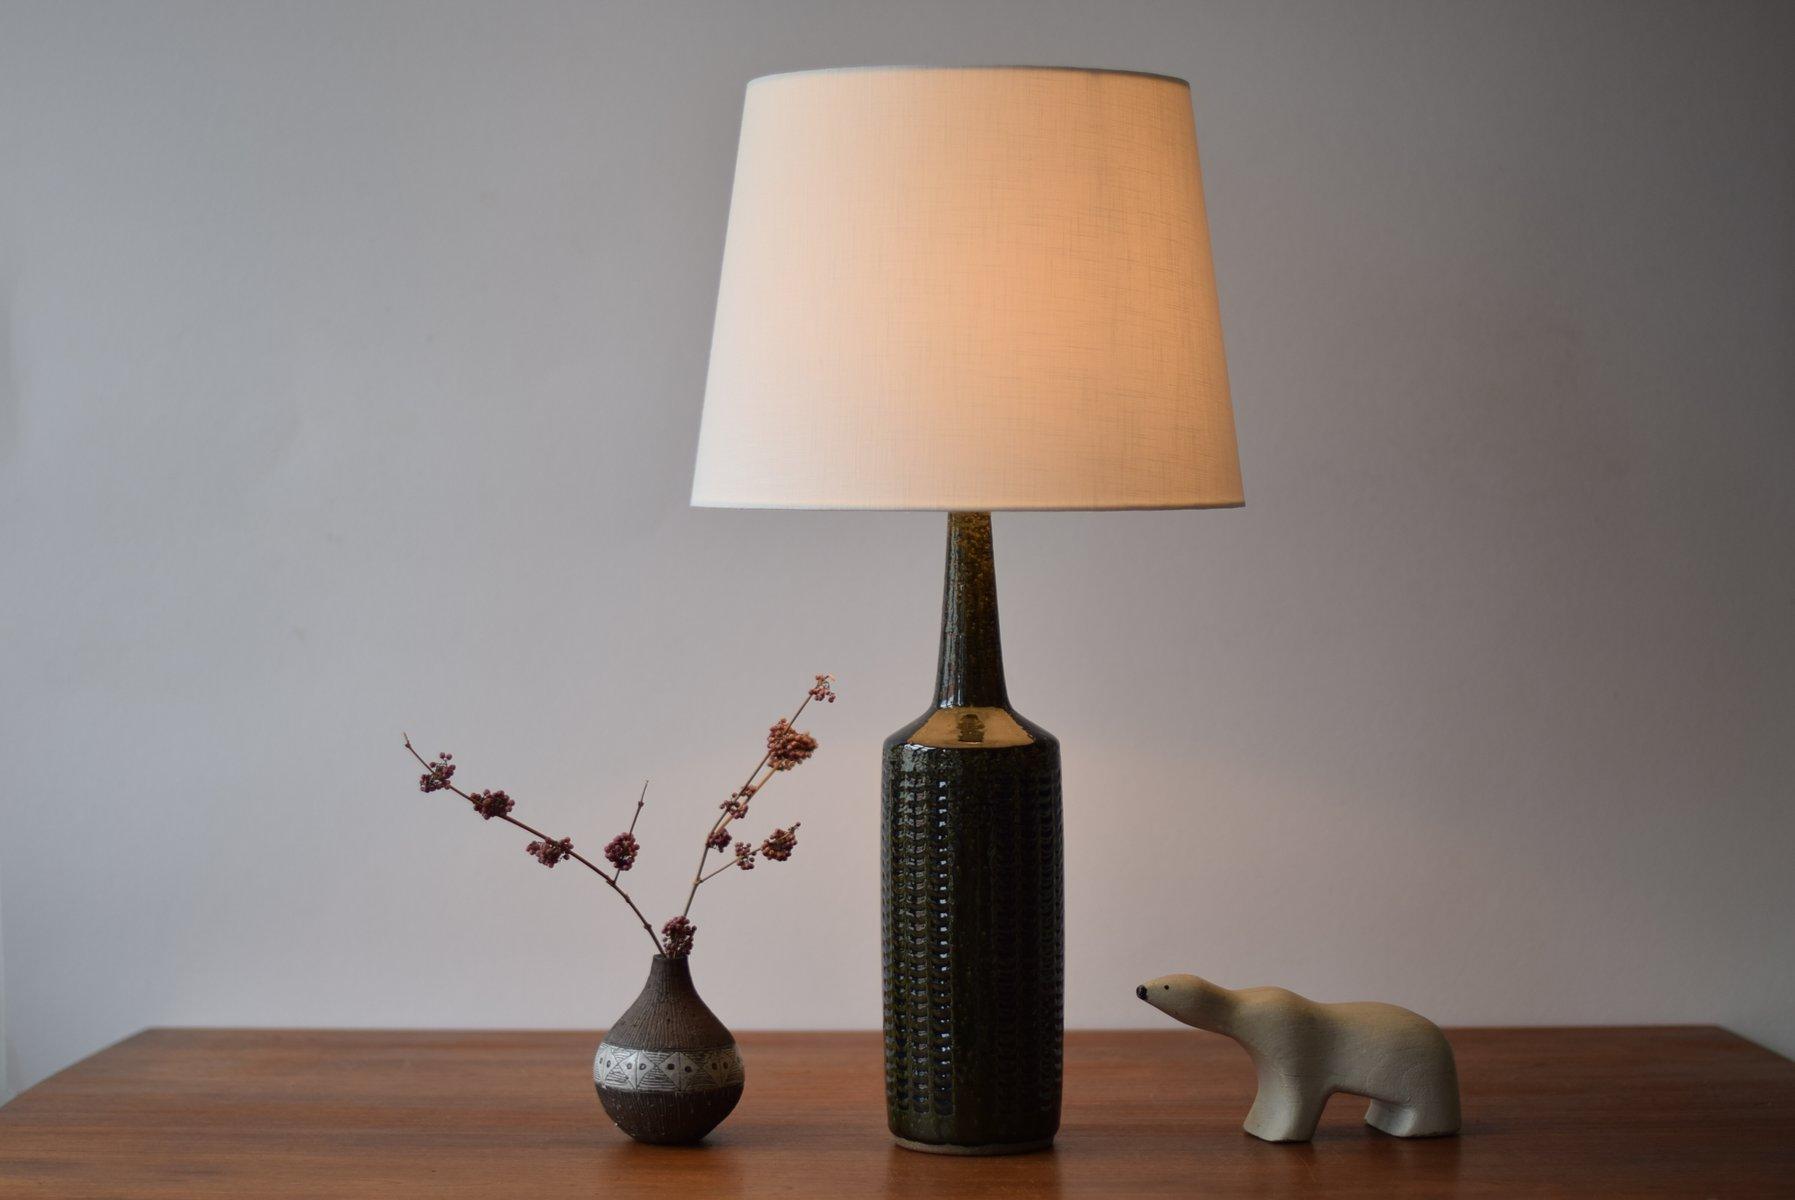 lampadaire scandinave bleu id e votre maison 2019 guiltypleasuresclub. Black Bedroom Furniture Sets. Home Design Ideas